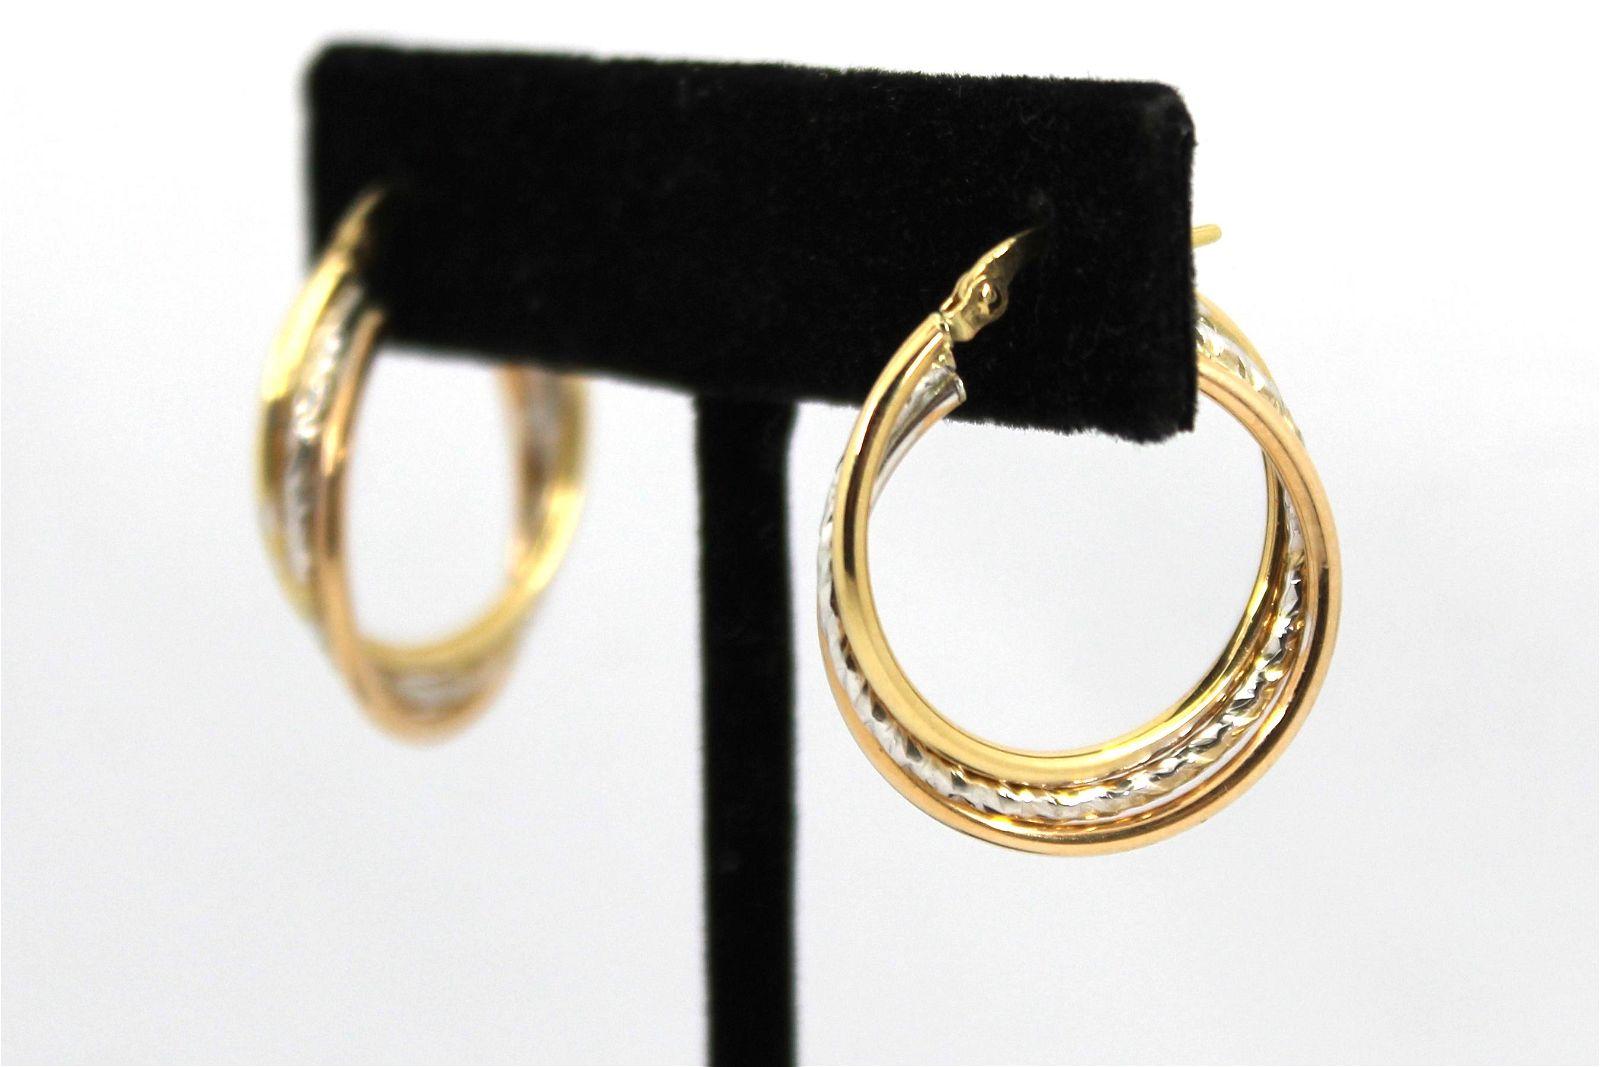 Italian 14K Yellow & White Gold Hoop Earrings